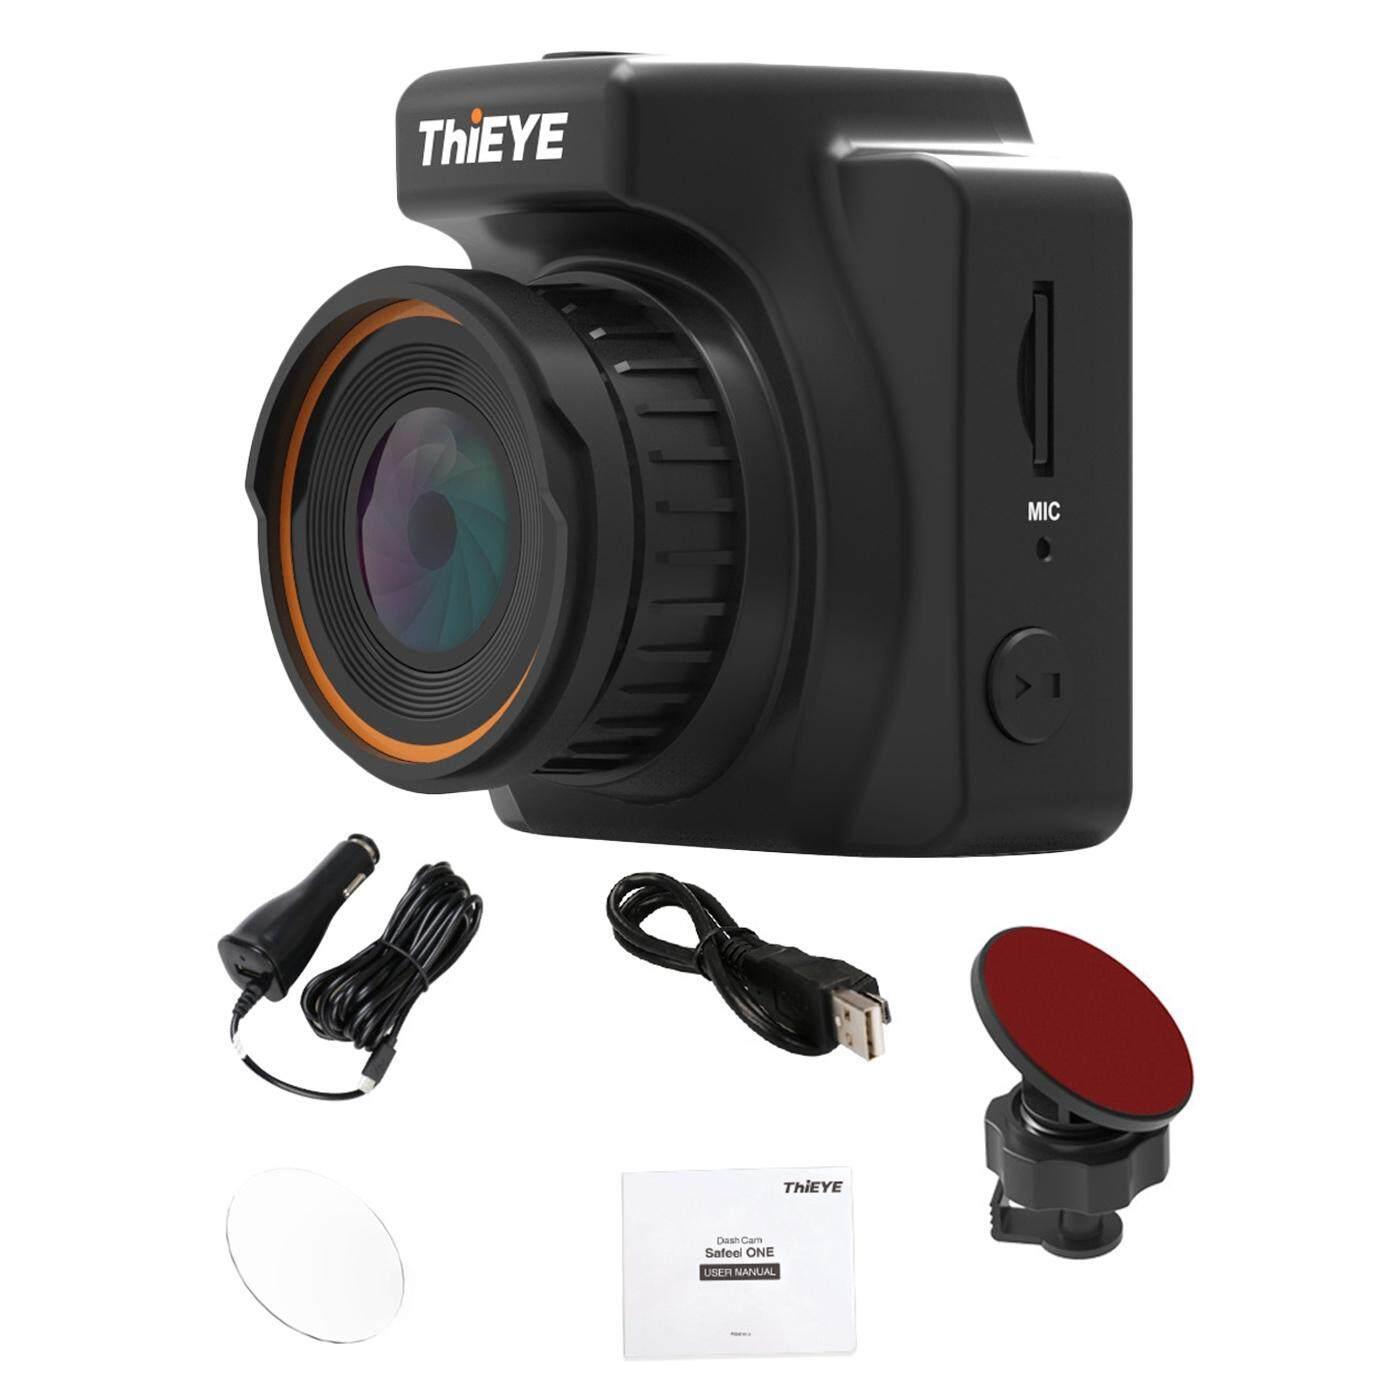 hight resolution of thieye 1 5inch hd screen car dvr camera dash cam full hd 1296p video recorder 145